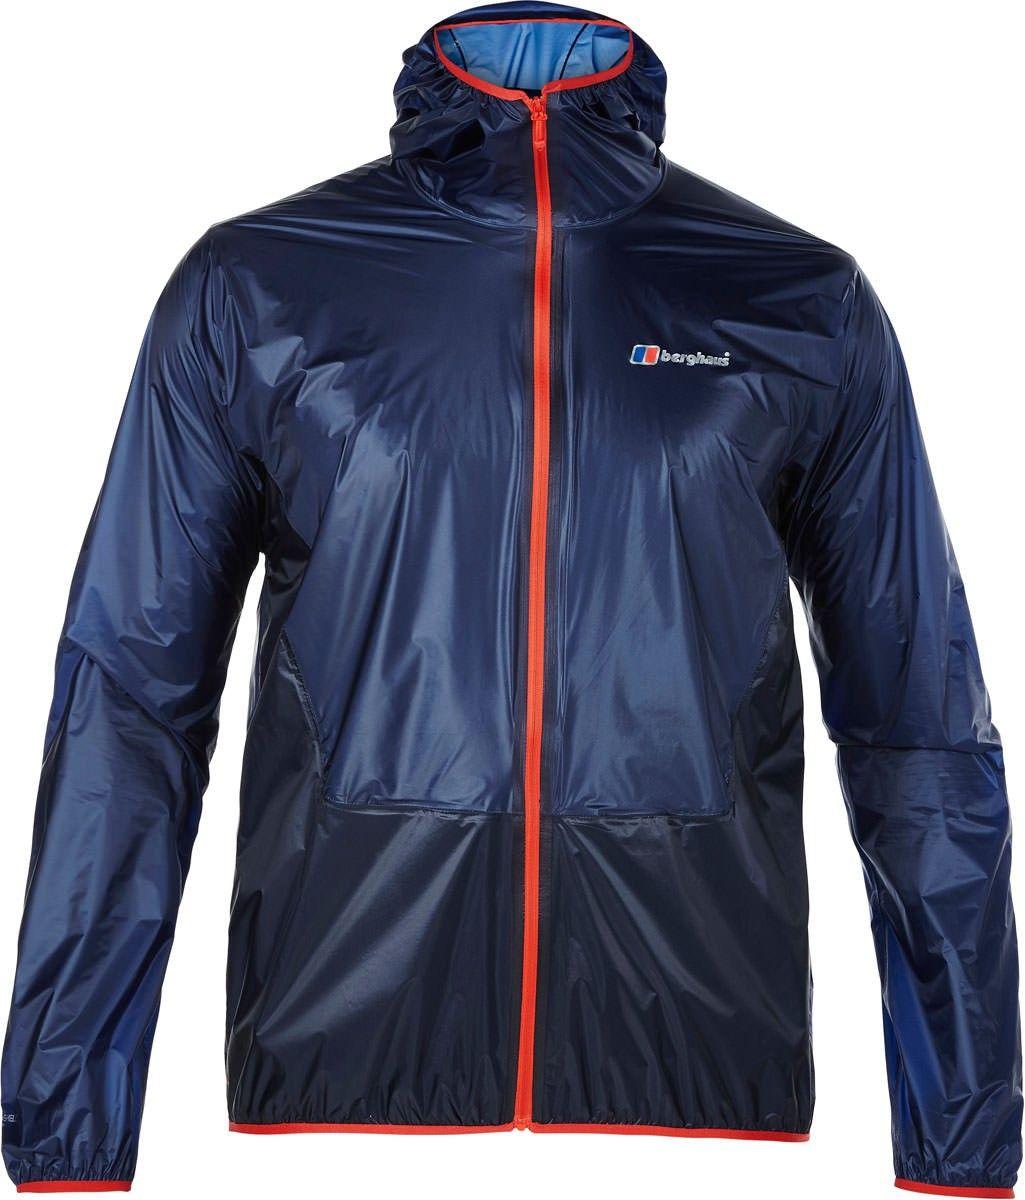 Berghaus Men's Hyper Jacket